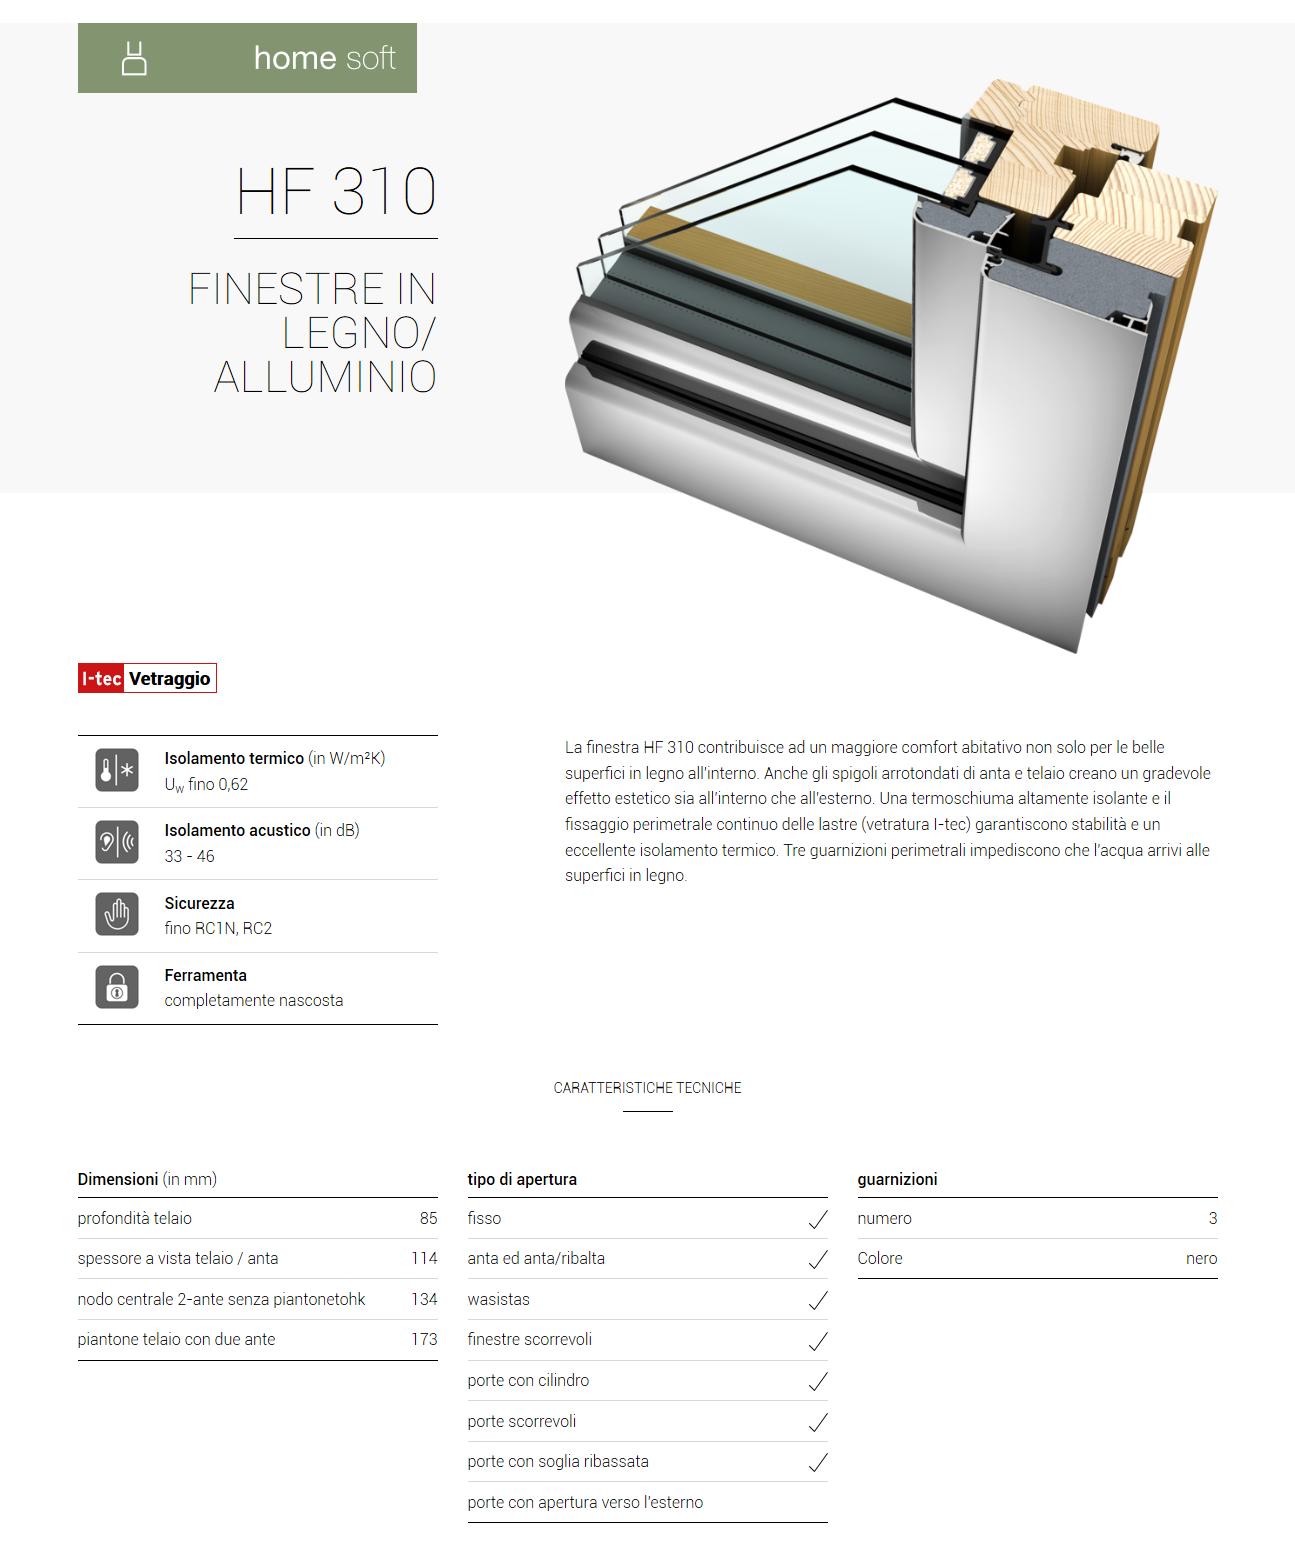 hf 310 soft